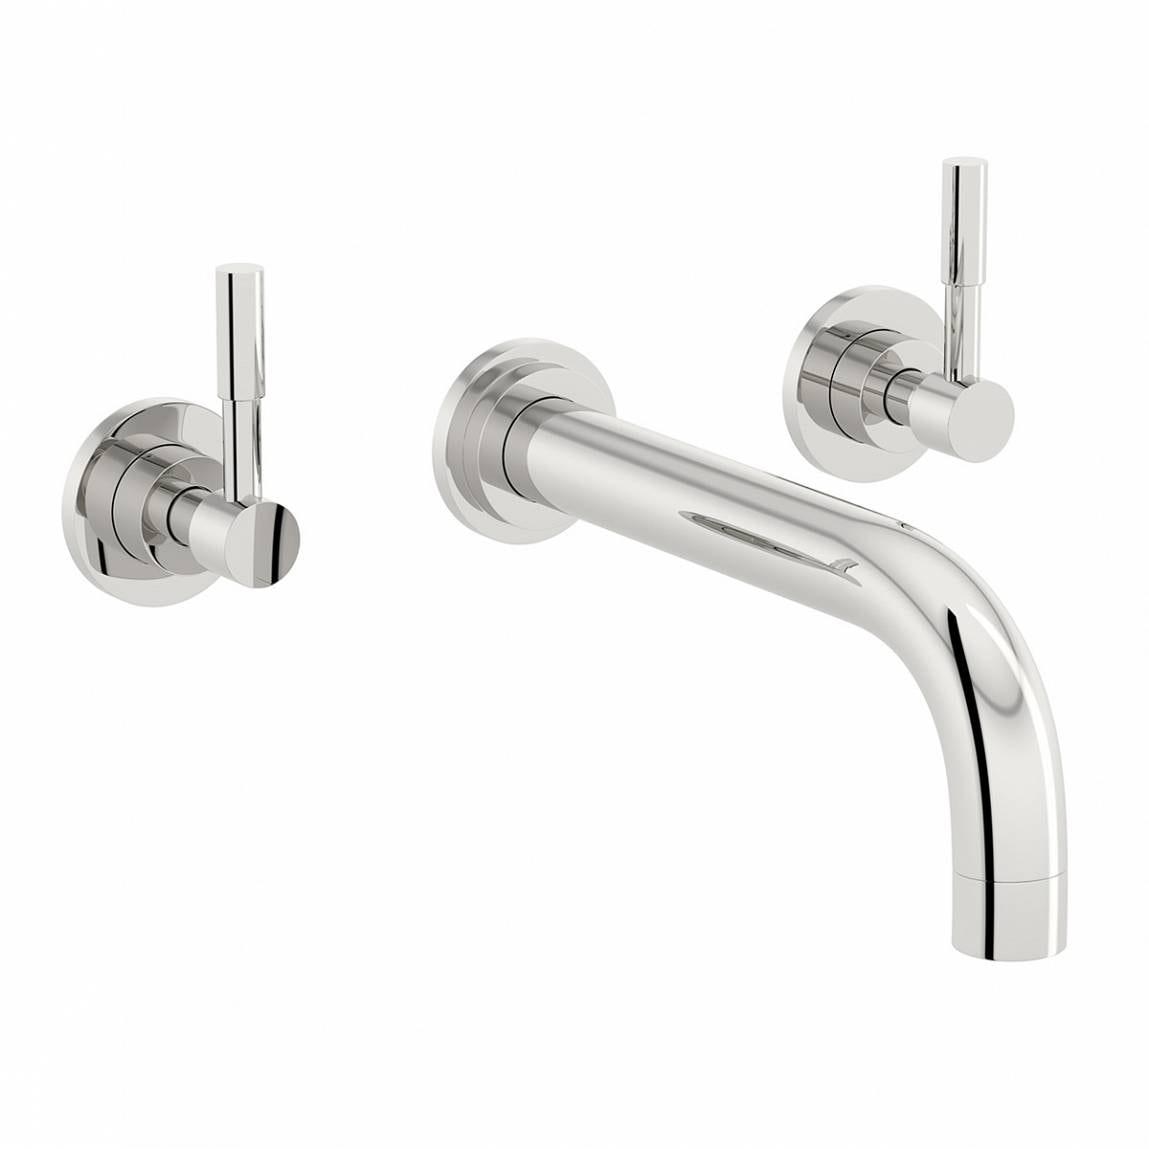 mode harrison wall mounted basin mixer tap offer pack. Black Bedroom Furniture Sets. Home Design Ideas